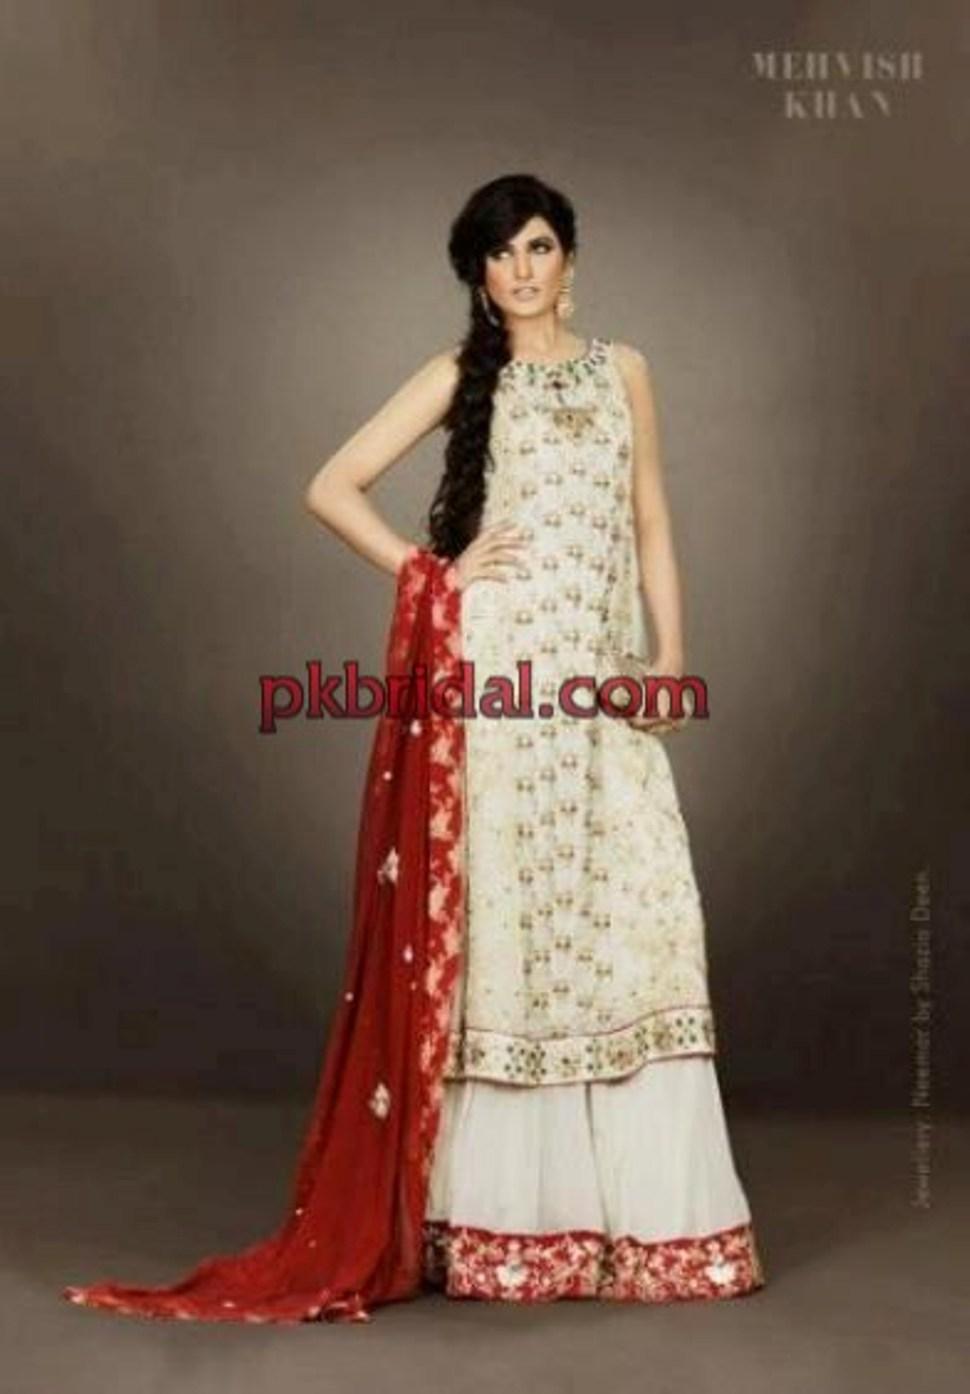 pakistani-partywear-134